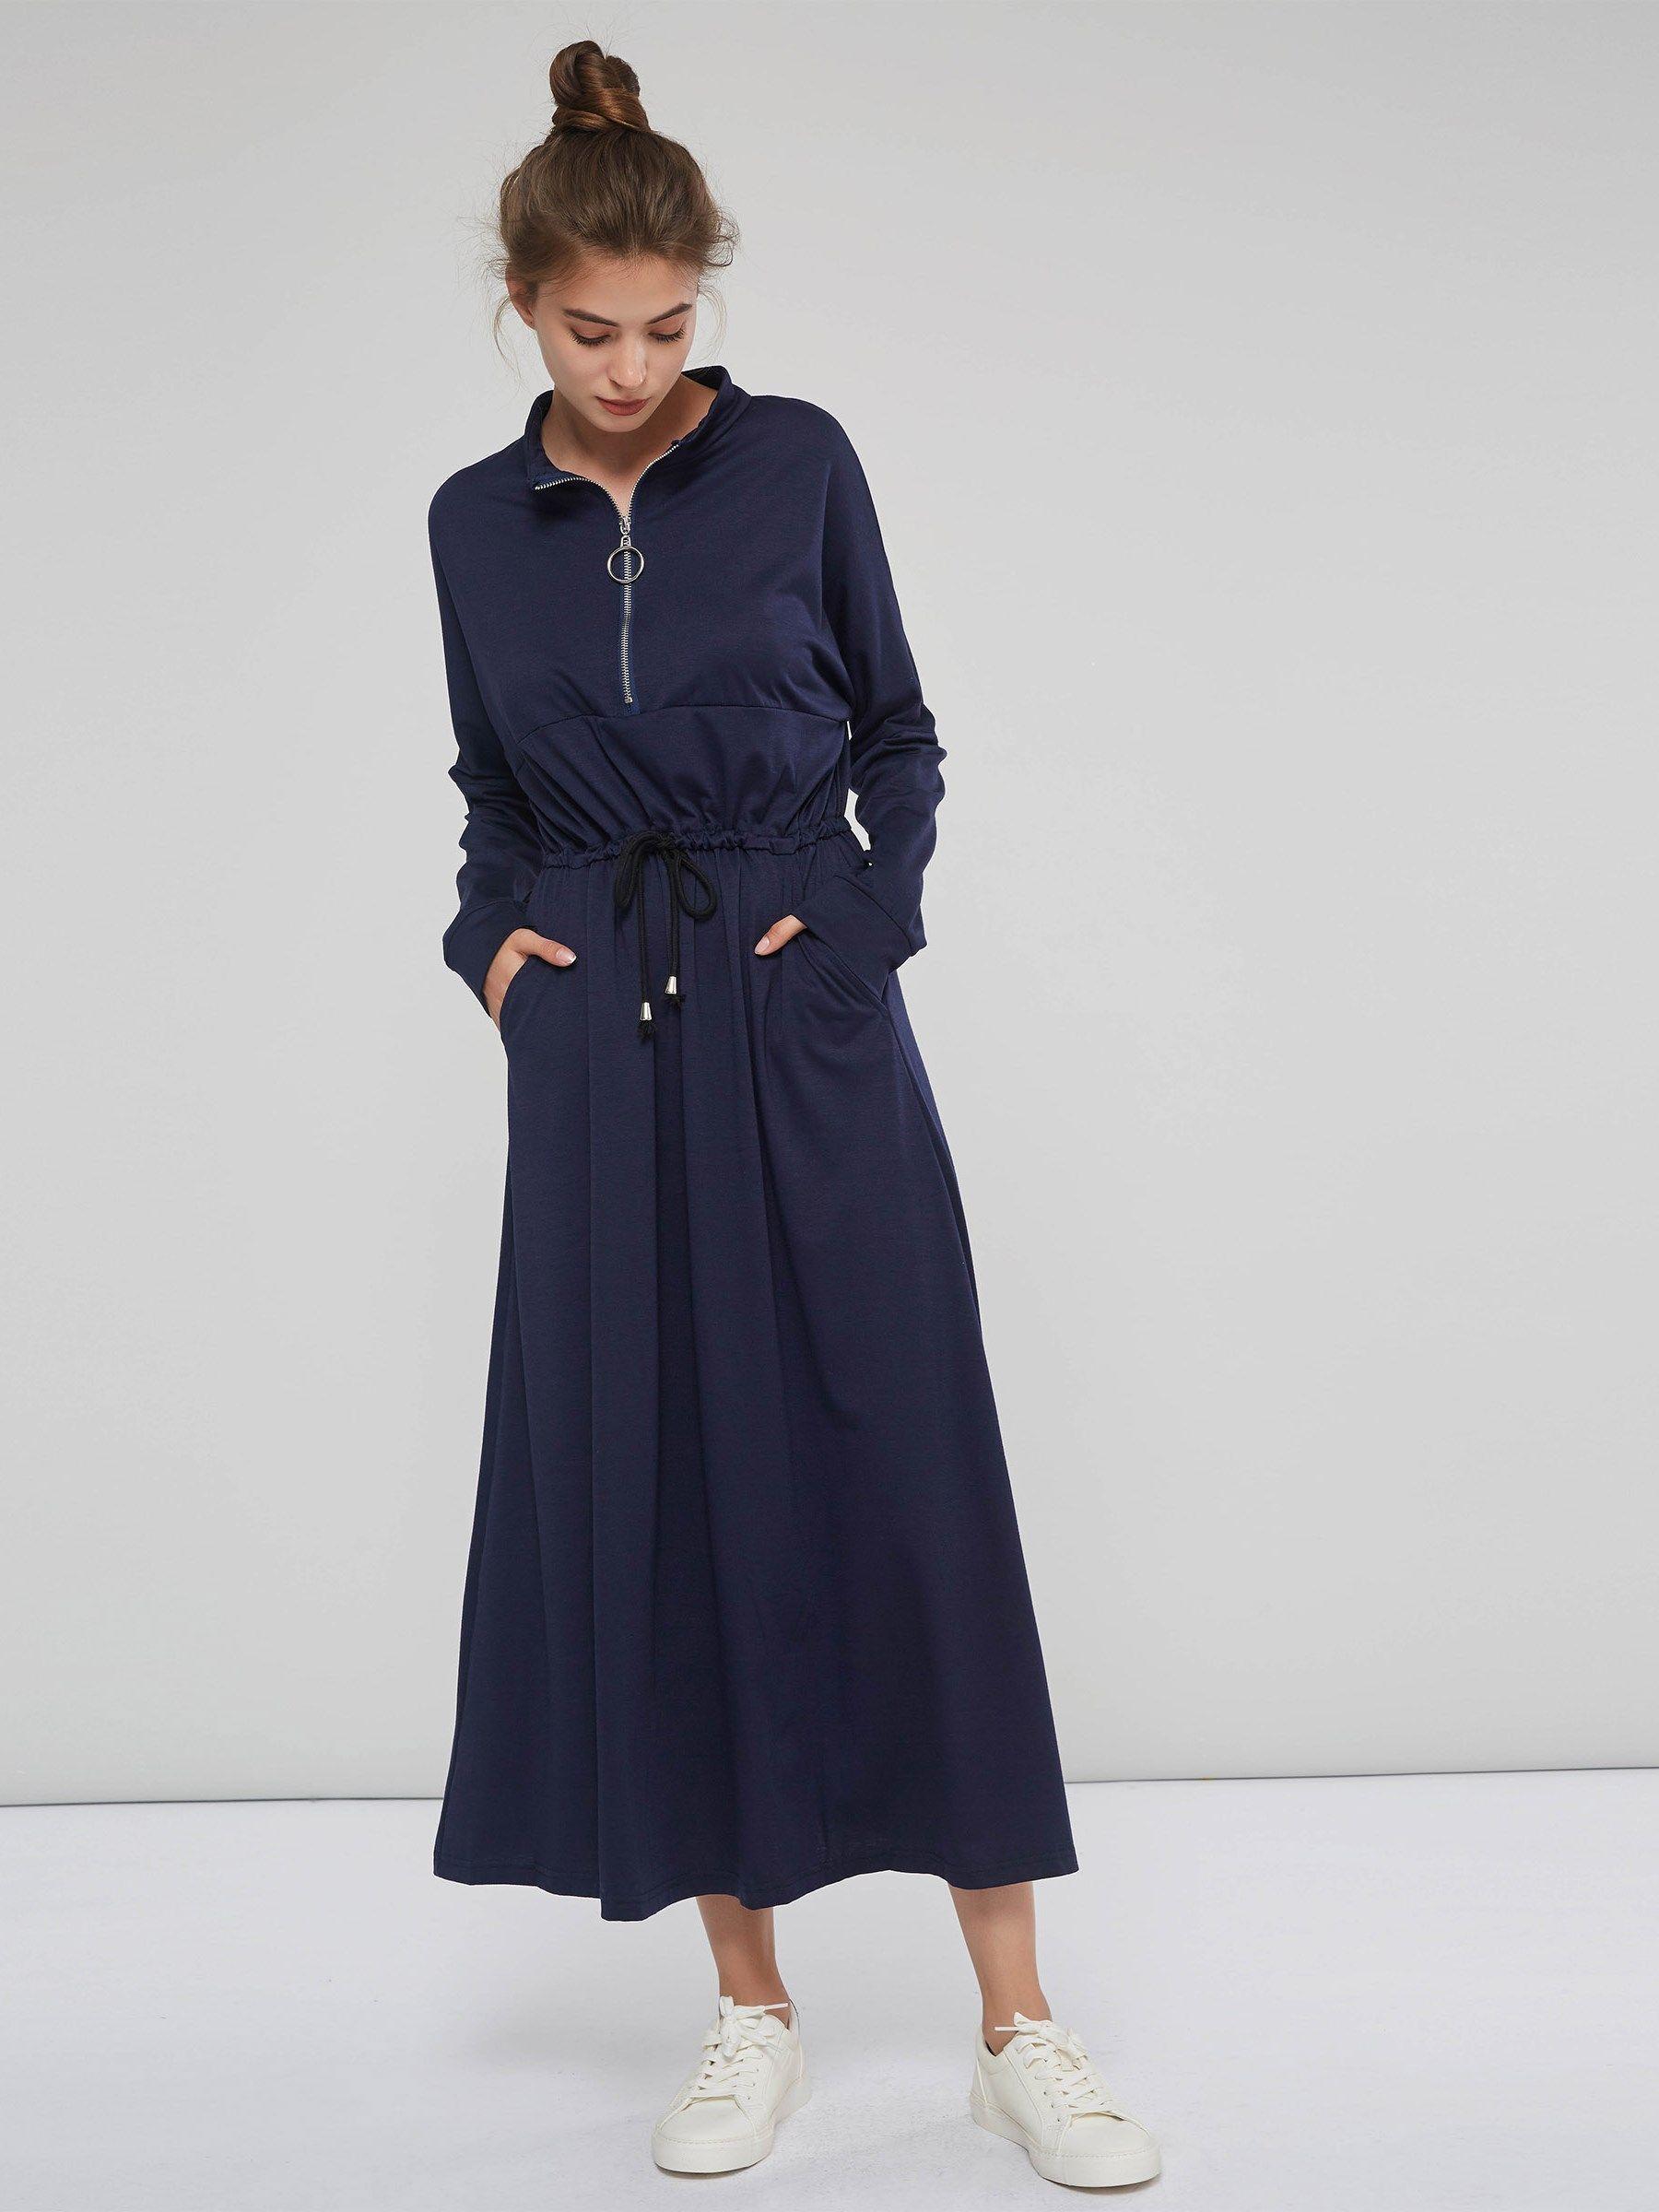 Long sleeve lace up zipper womenus maxi dress fall u winter